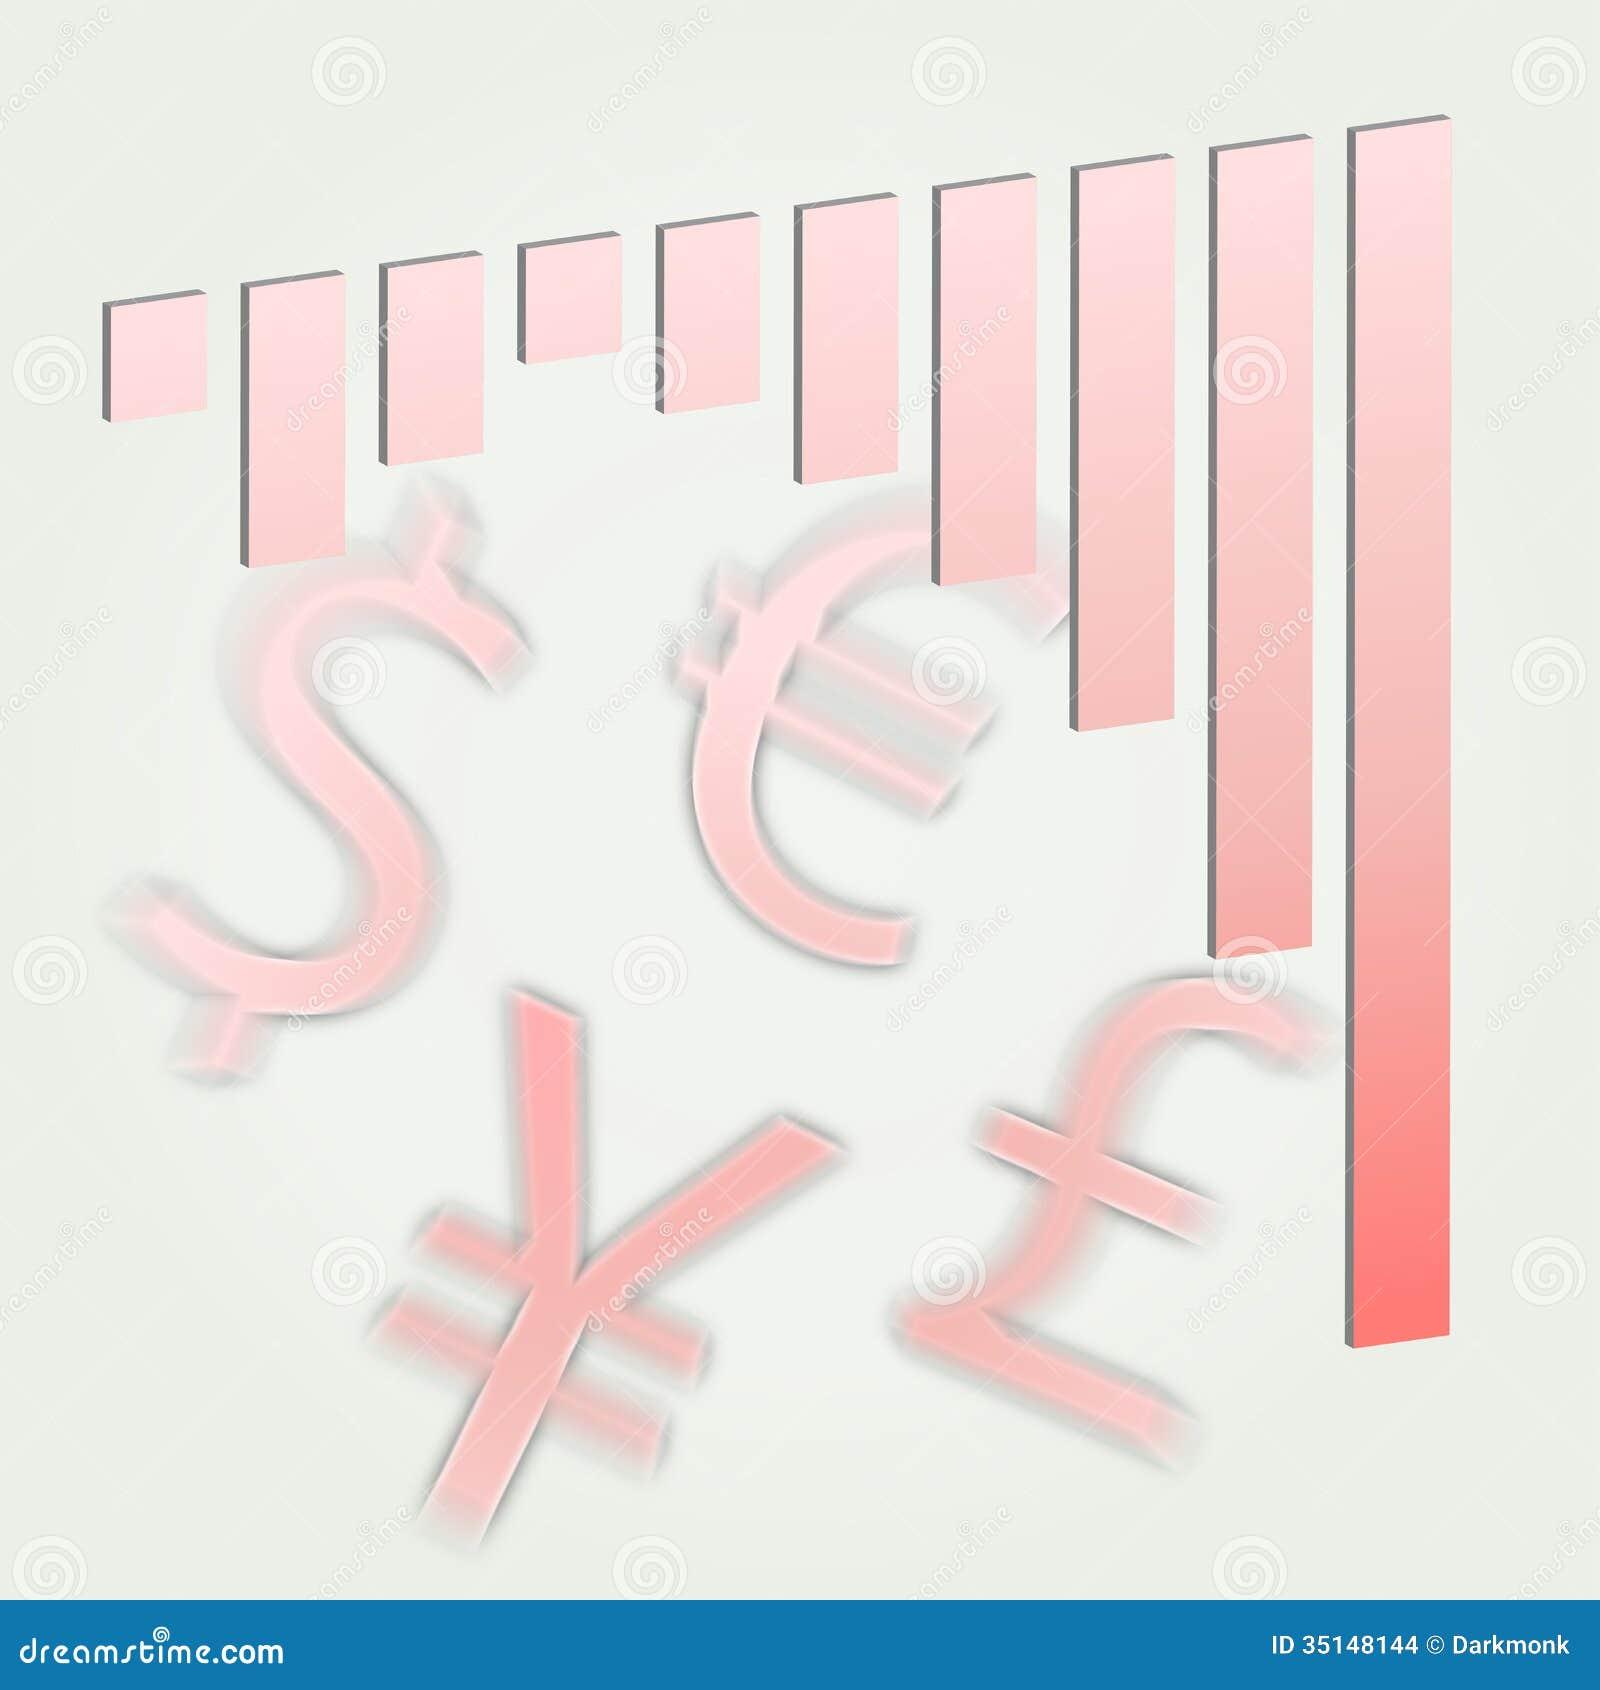 Financial bar graph showing increasing losses